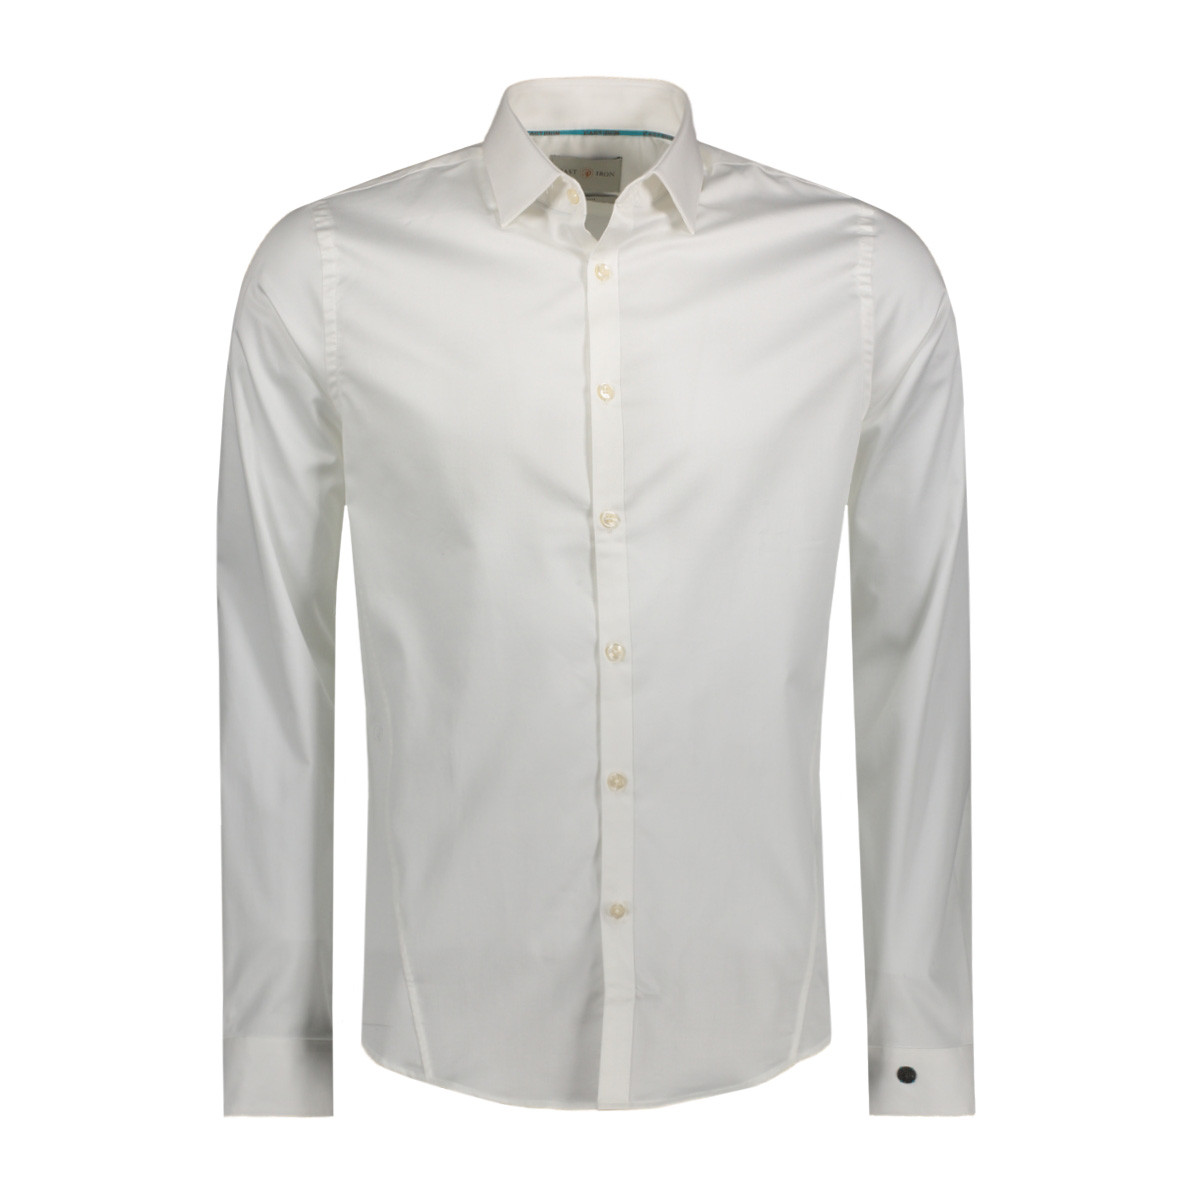 cobra shirt csi00429 cast iron overhemd 900